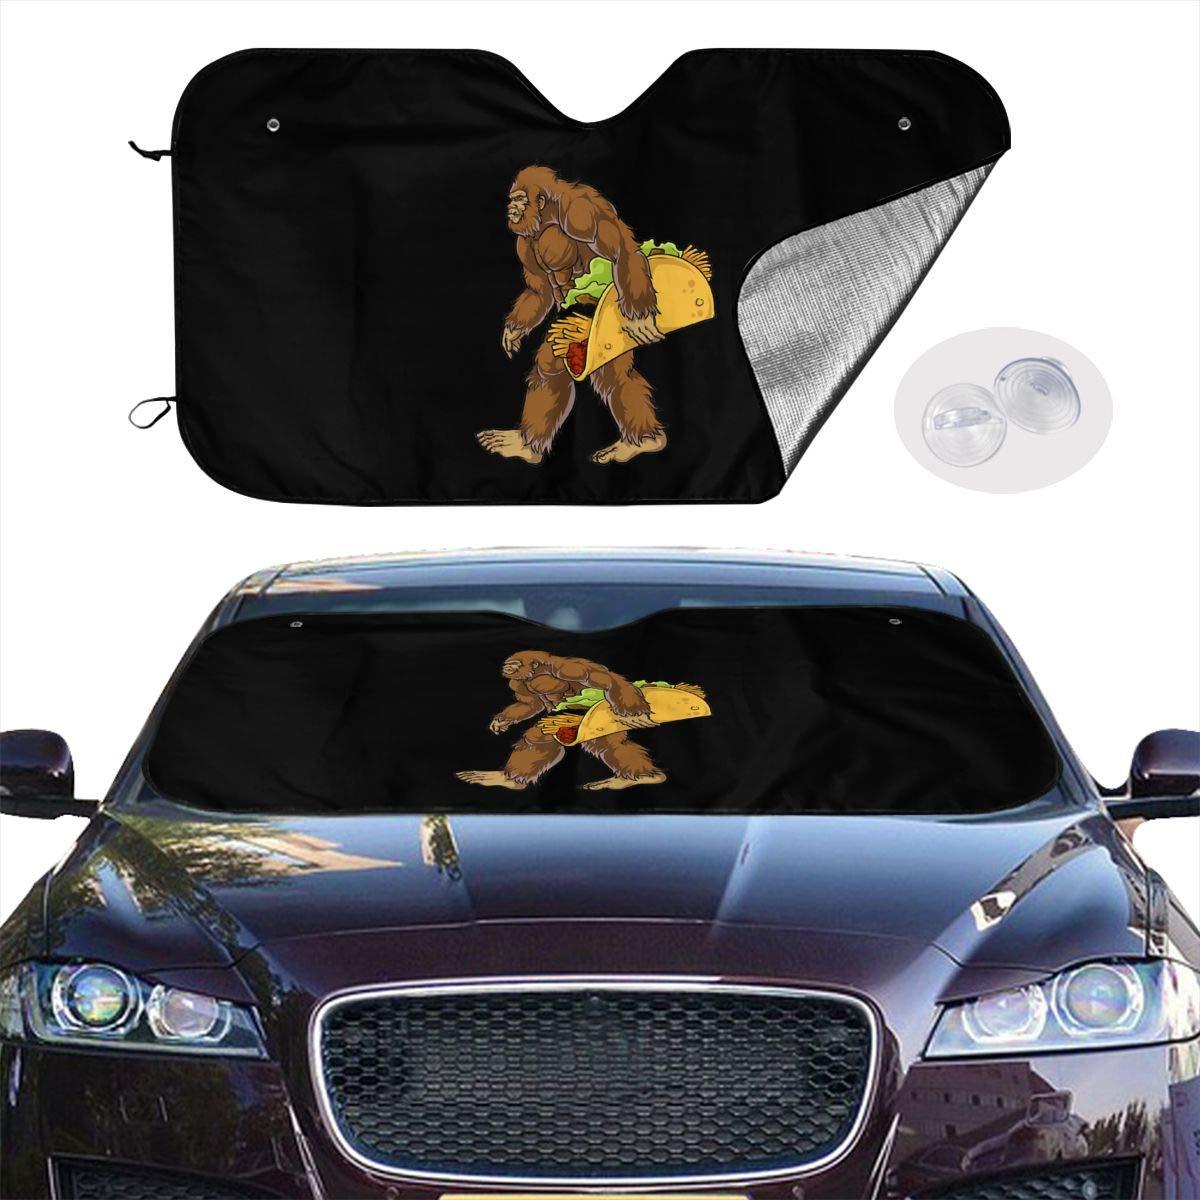 Bigfoot Carrying Taco Windshield Sun Shade Blocks Uv Rays Sunshade Shield Sun Visor Protector Keeps Vehicle Cool for Sedan Truck Minivan